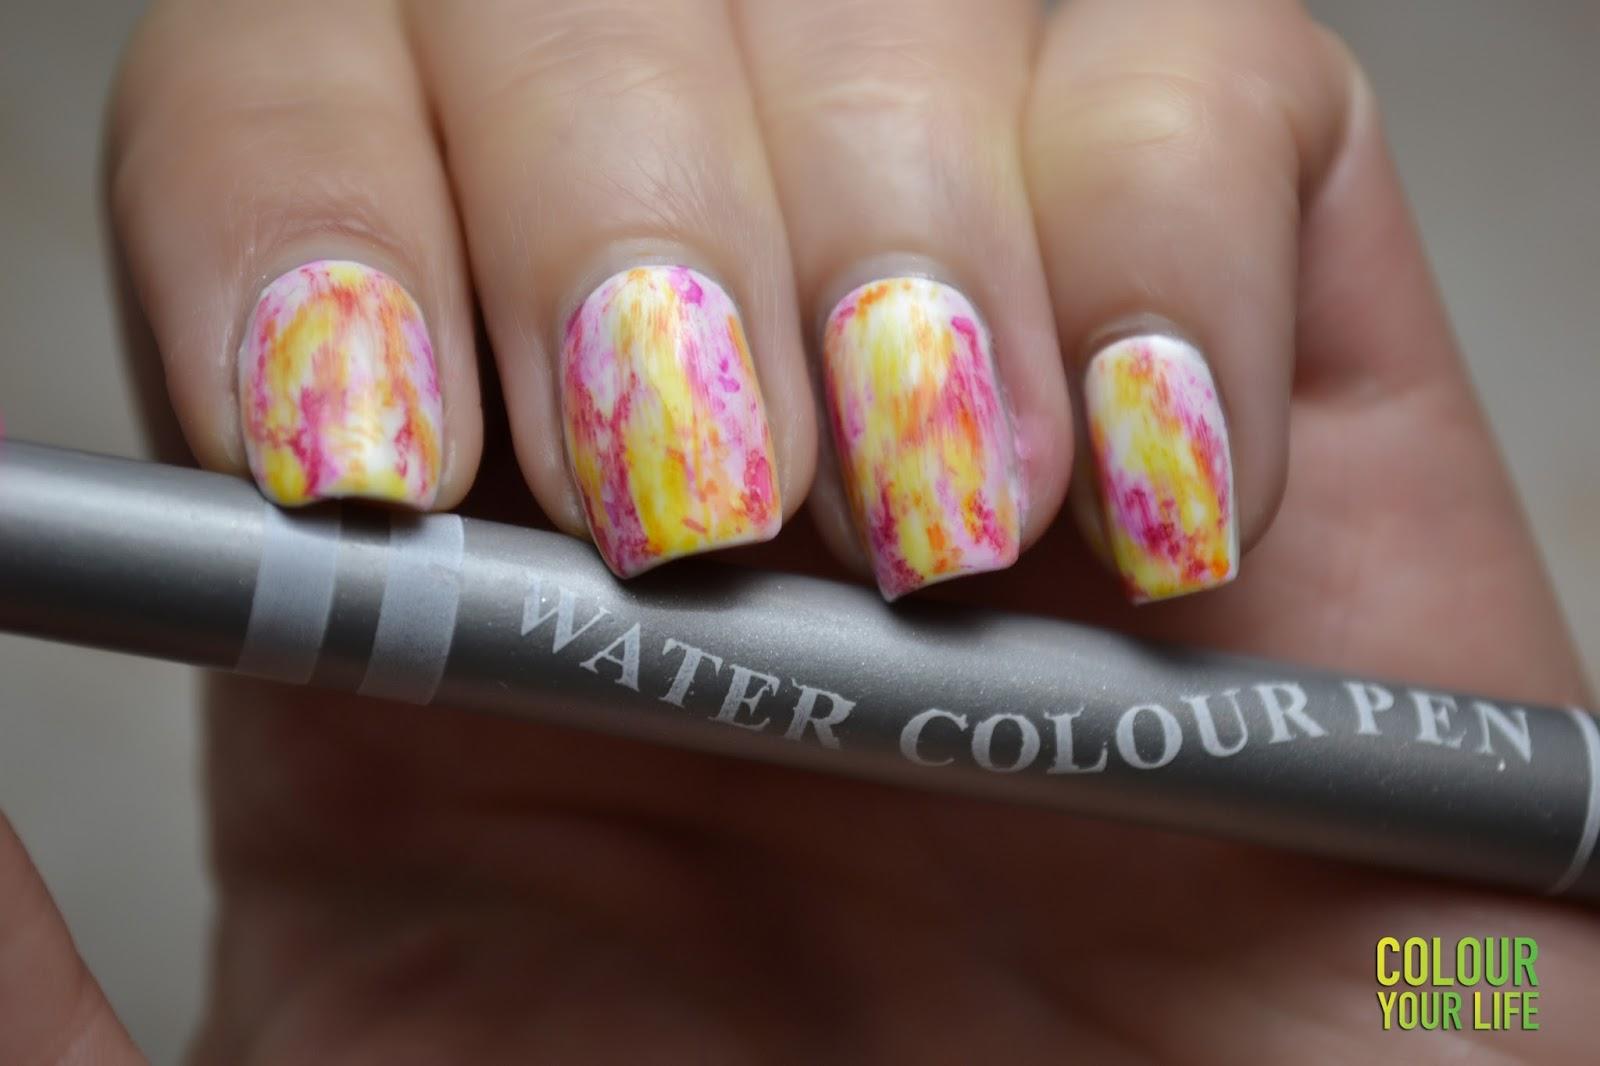 Colour your life: Nail Art Marathon - 3.Neon Nails